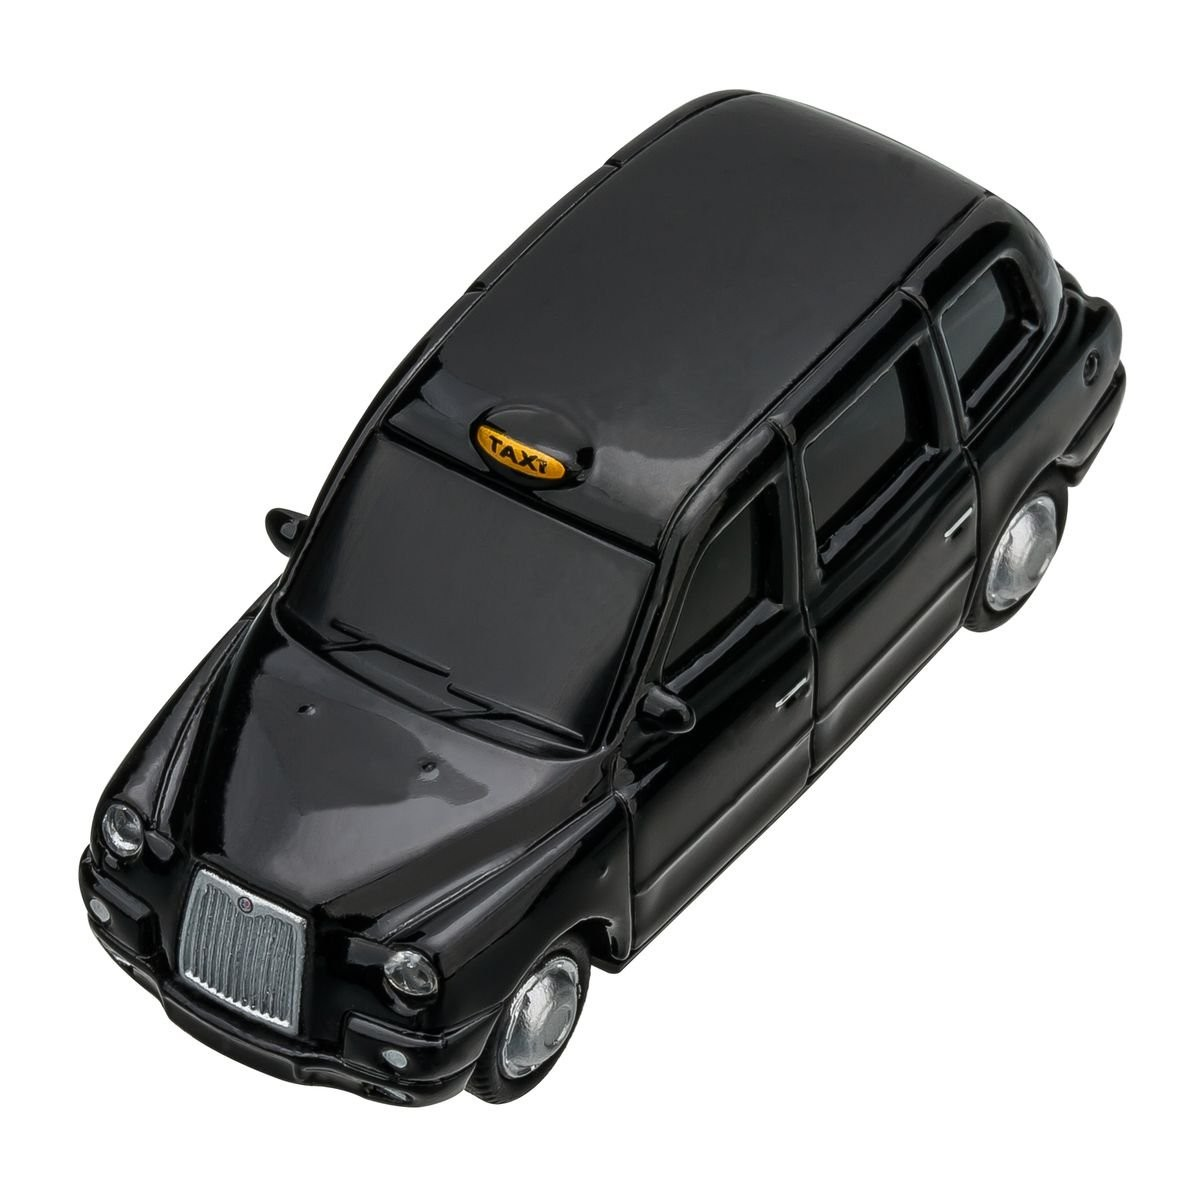 USB flash drive London Taxi TX4 1:72 BLACK 16GB, View 8